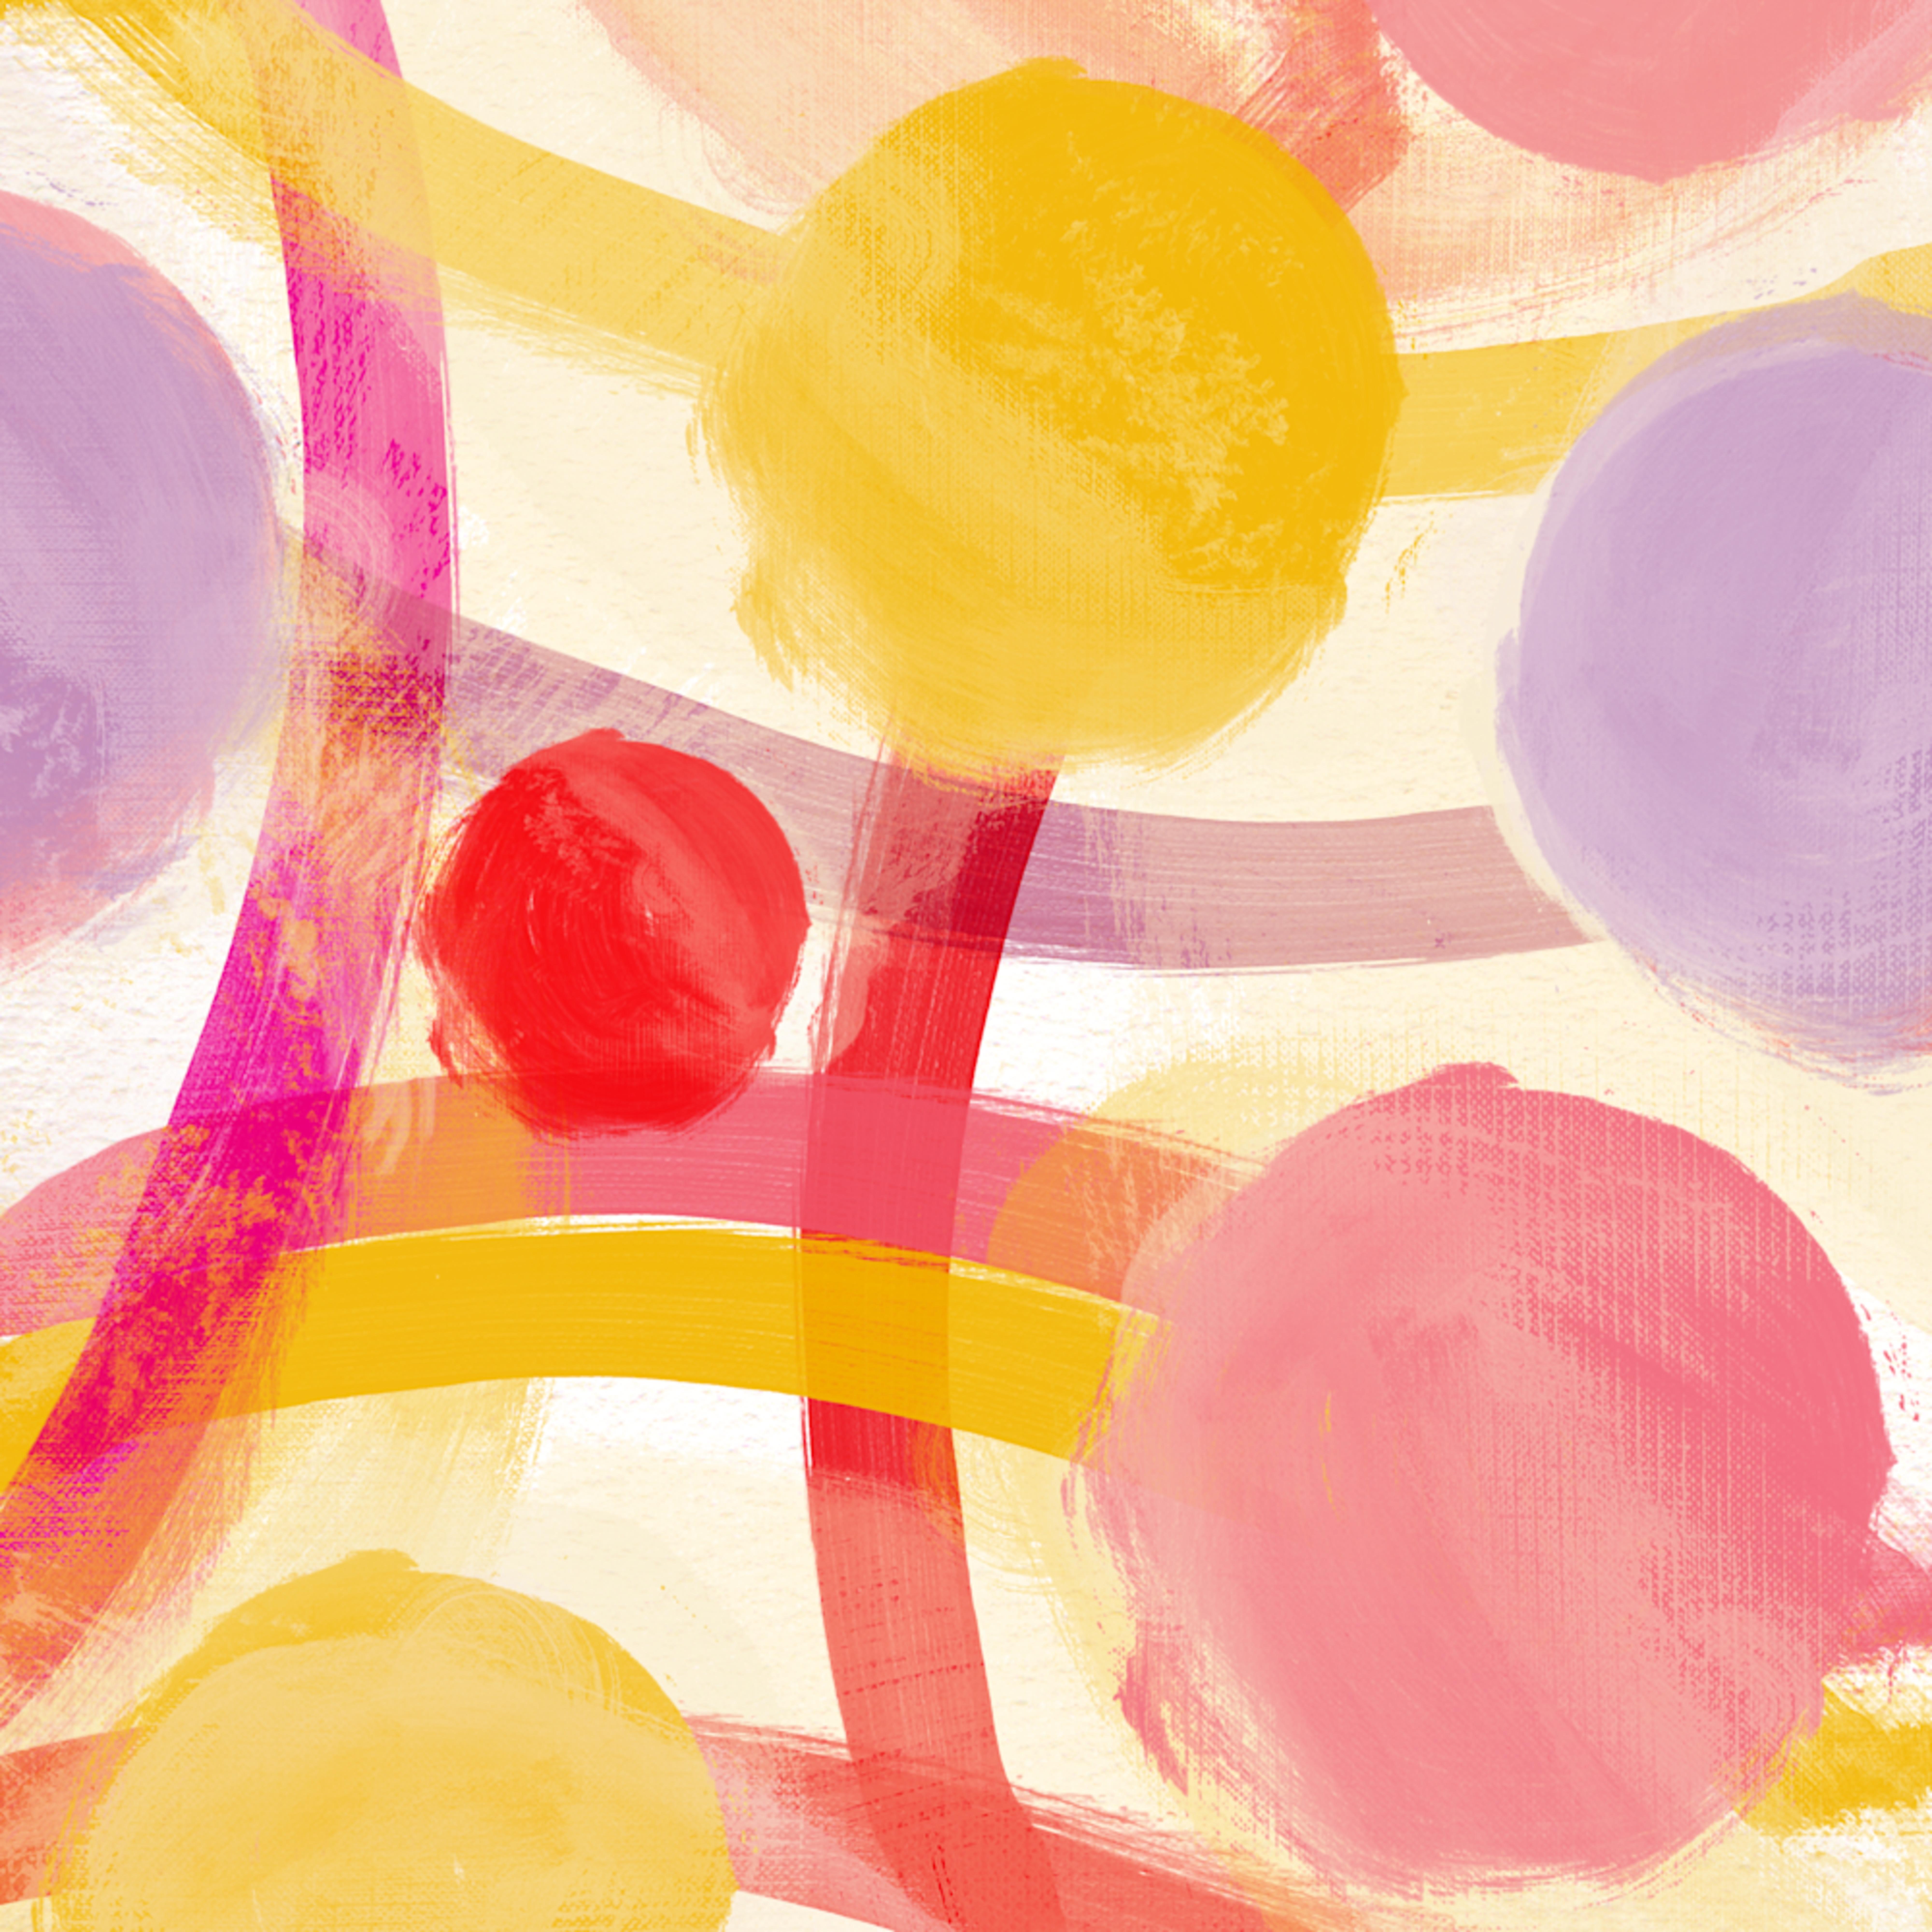 Abstract art 80 7 v6khwz